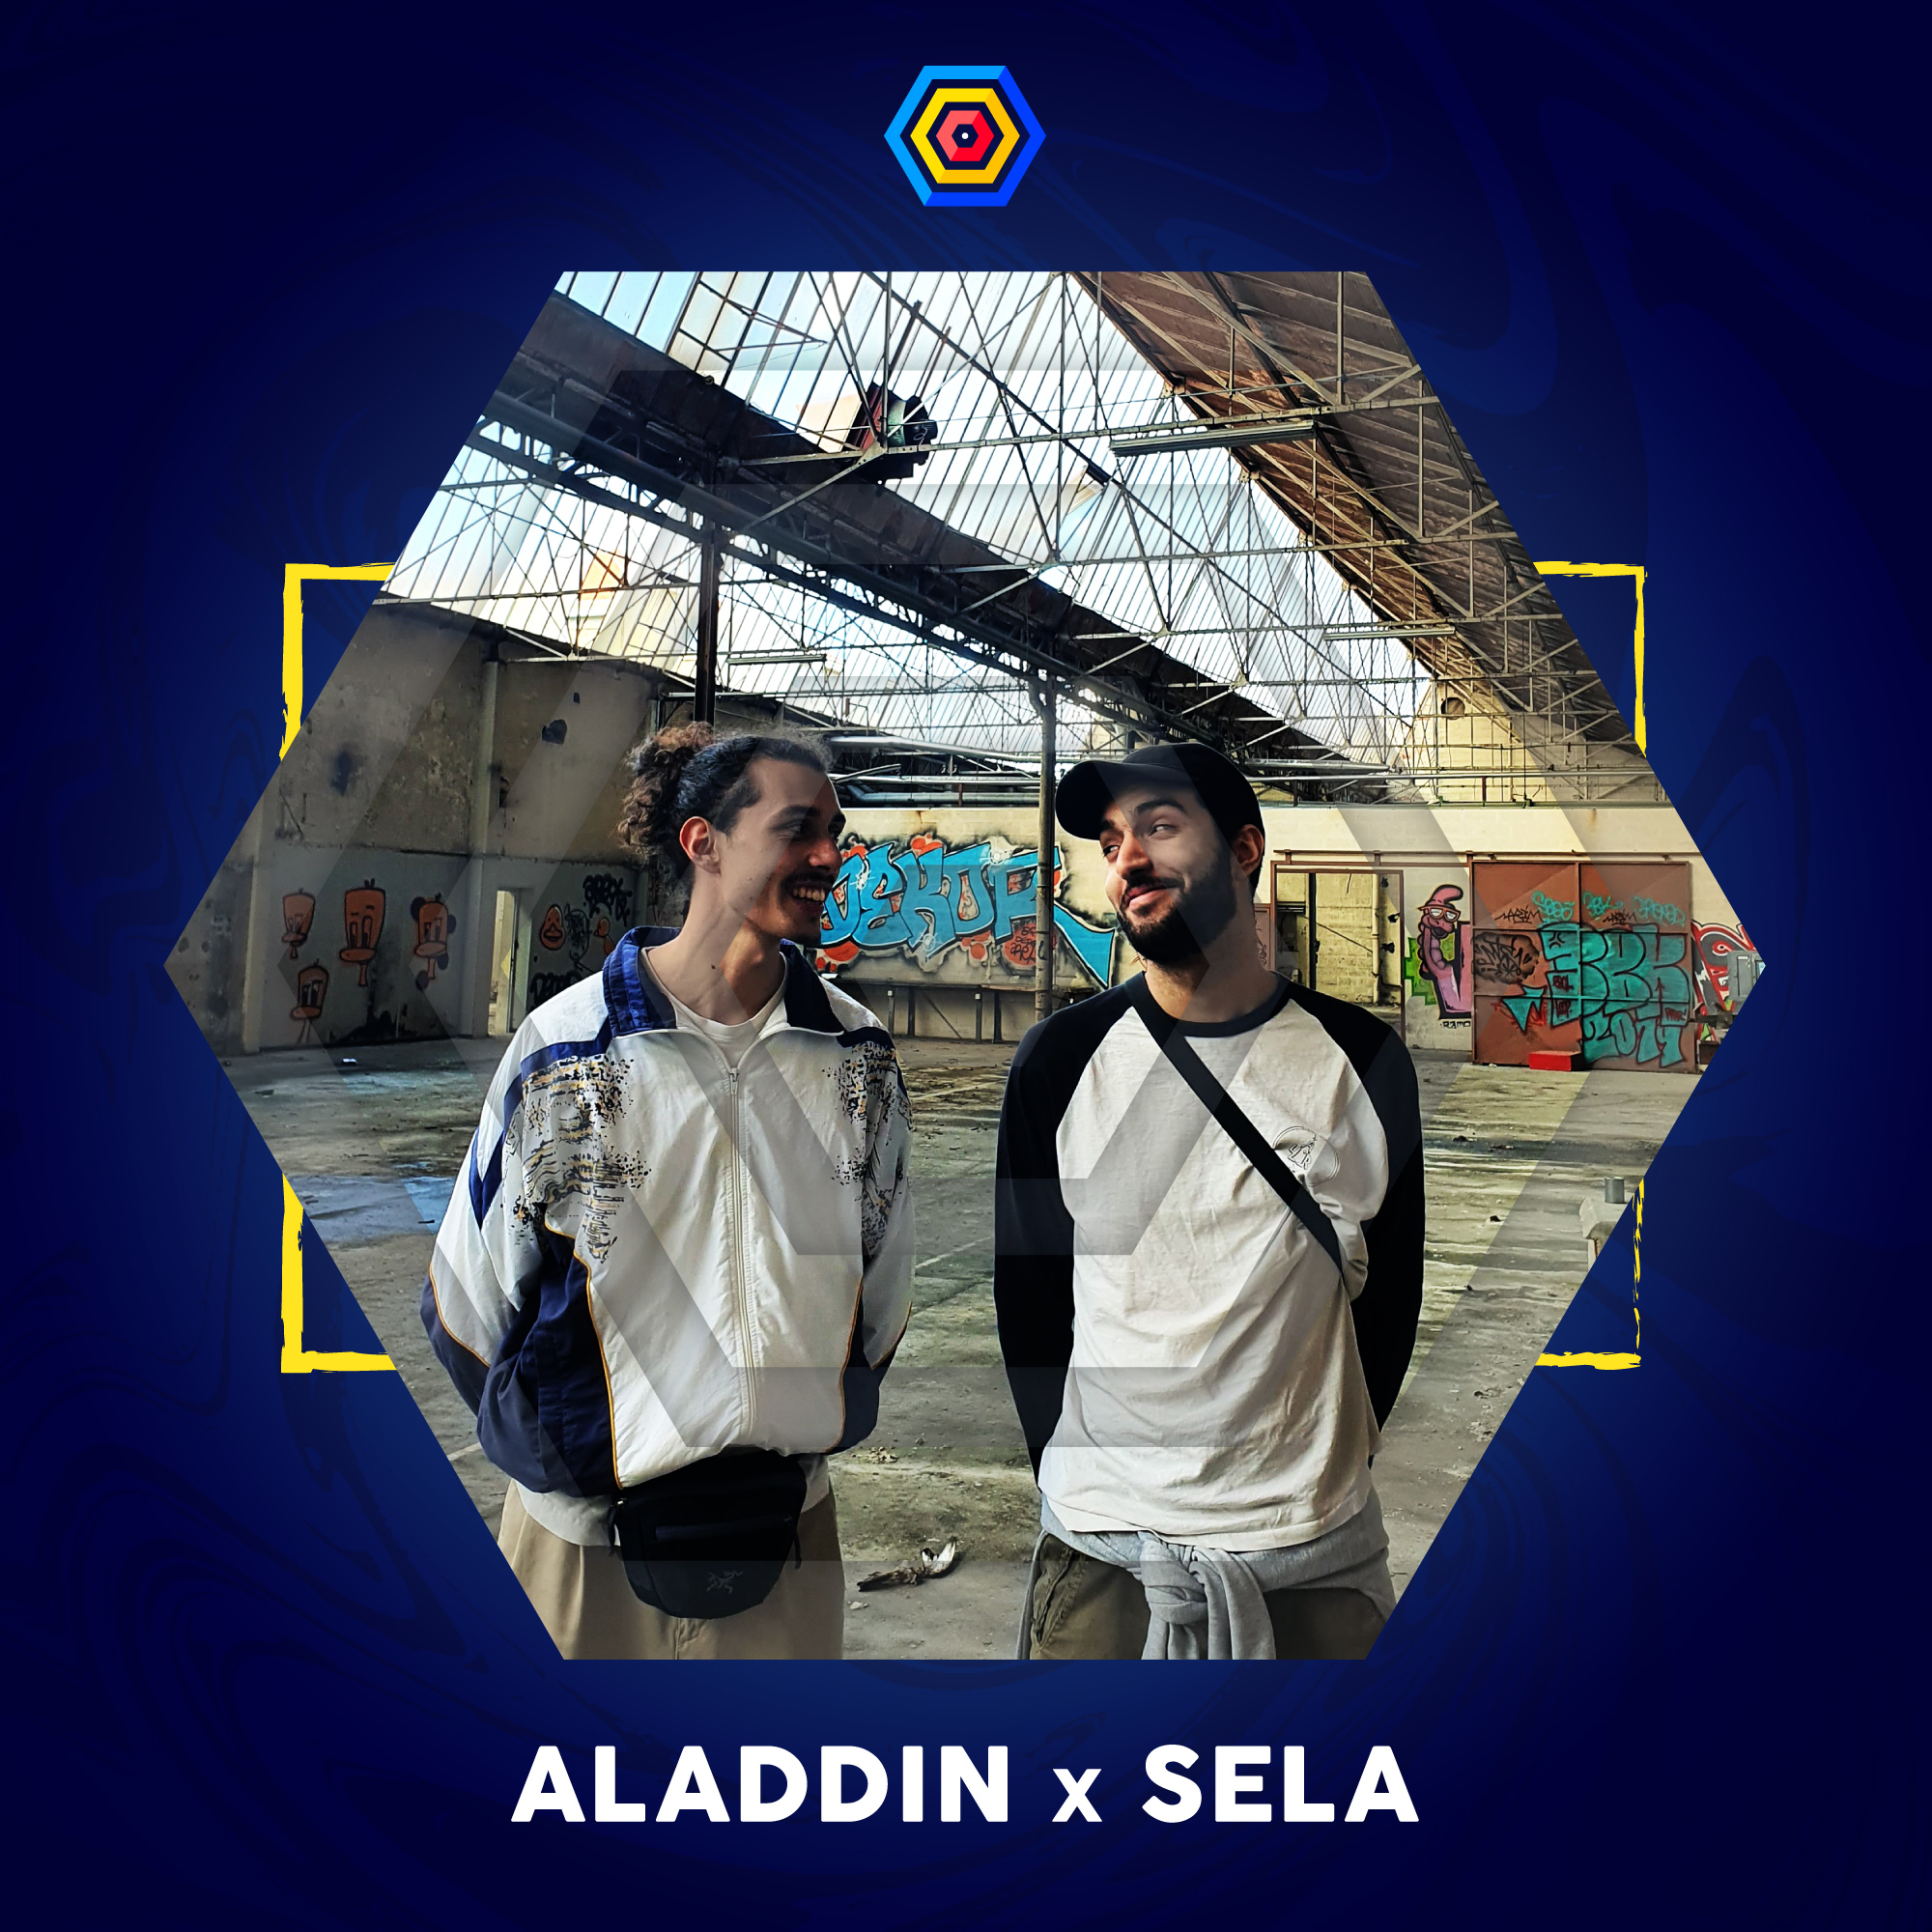 Aladdin-x-Sela